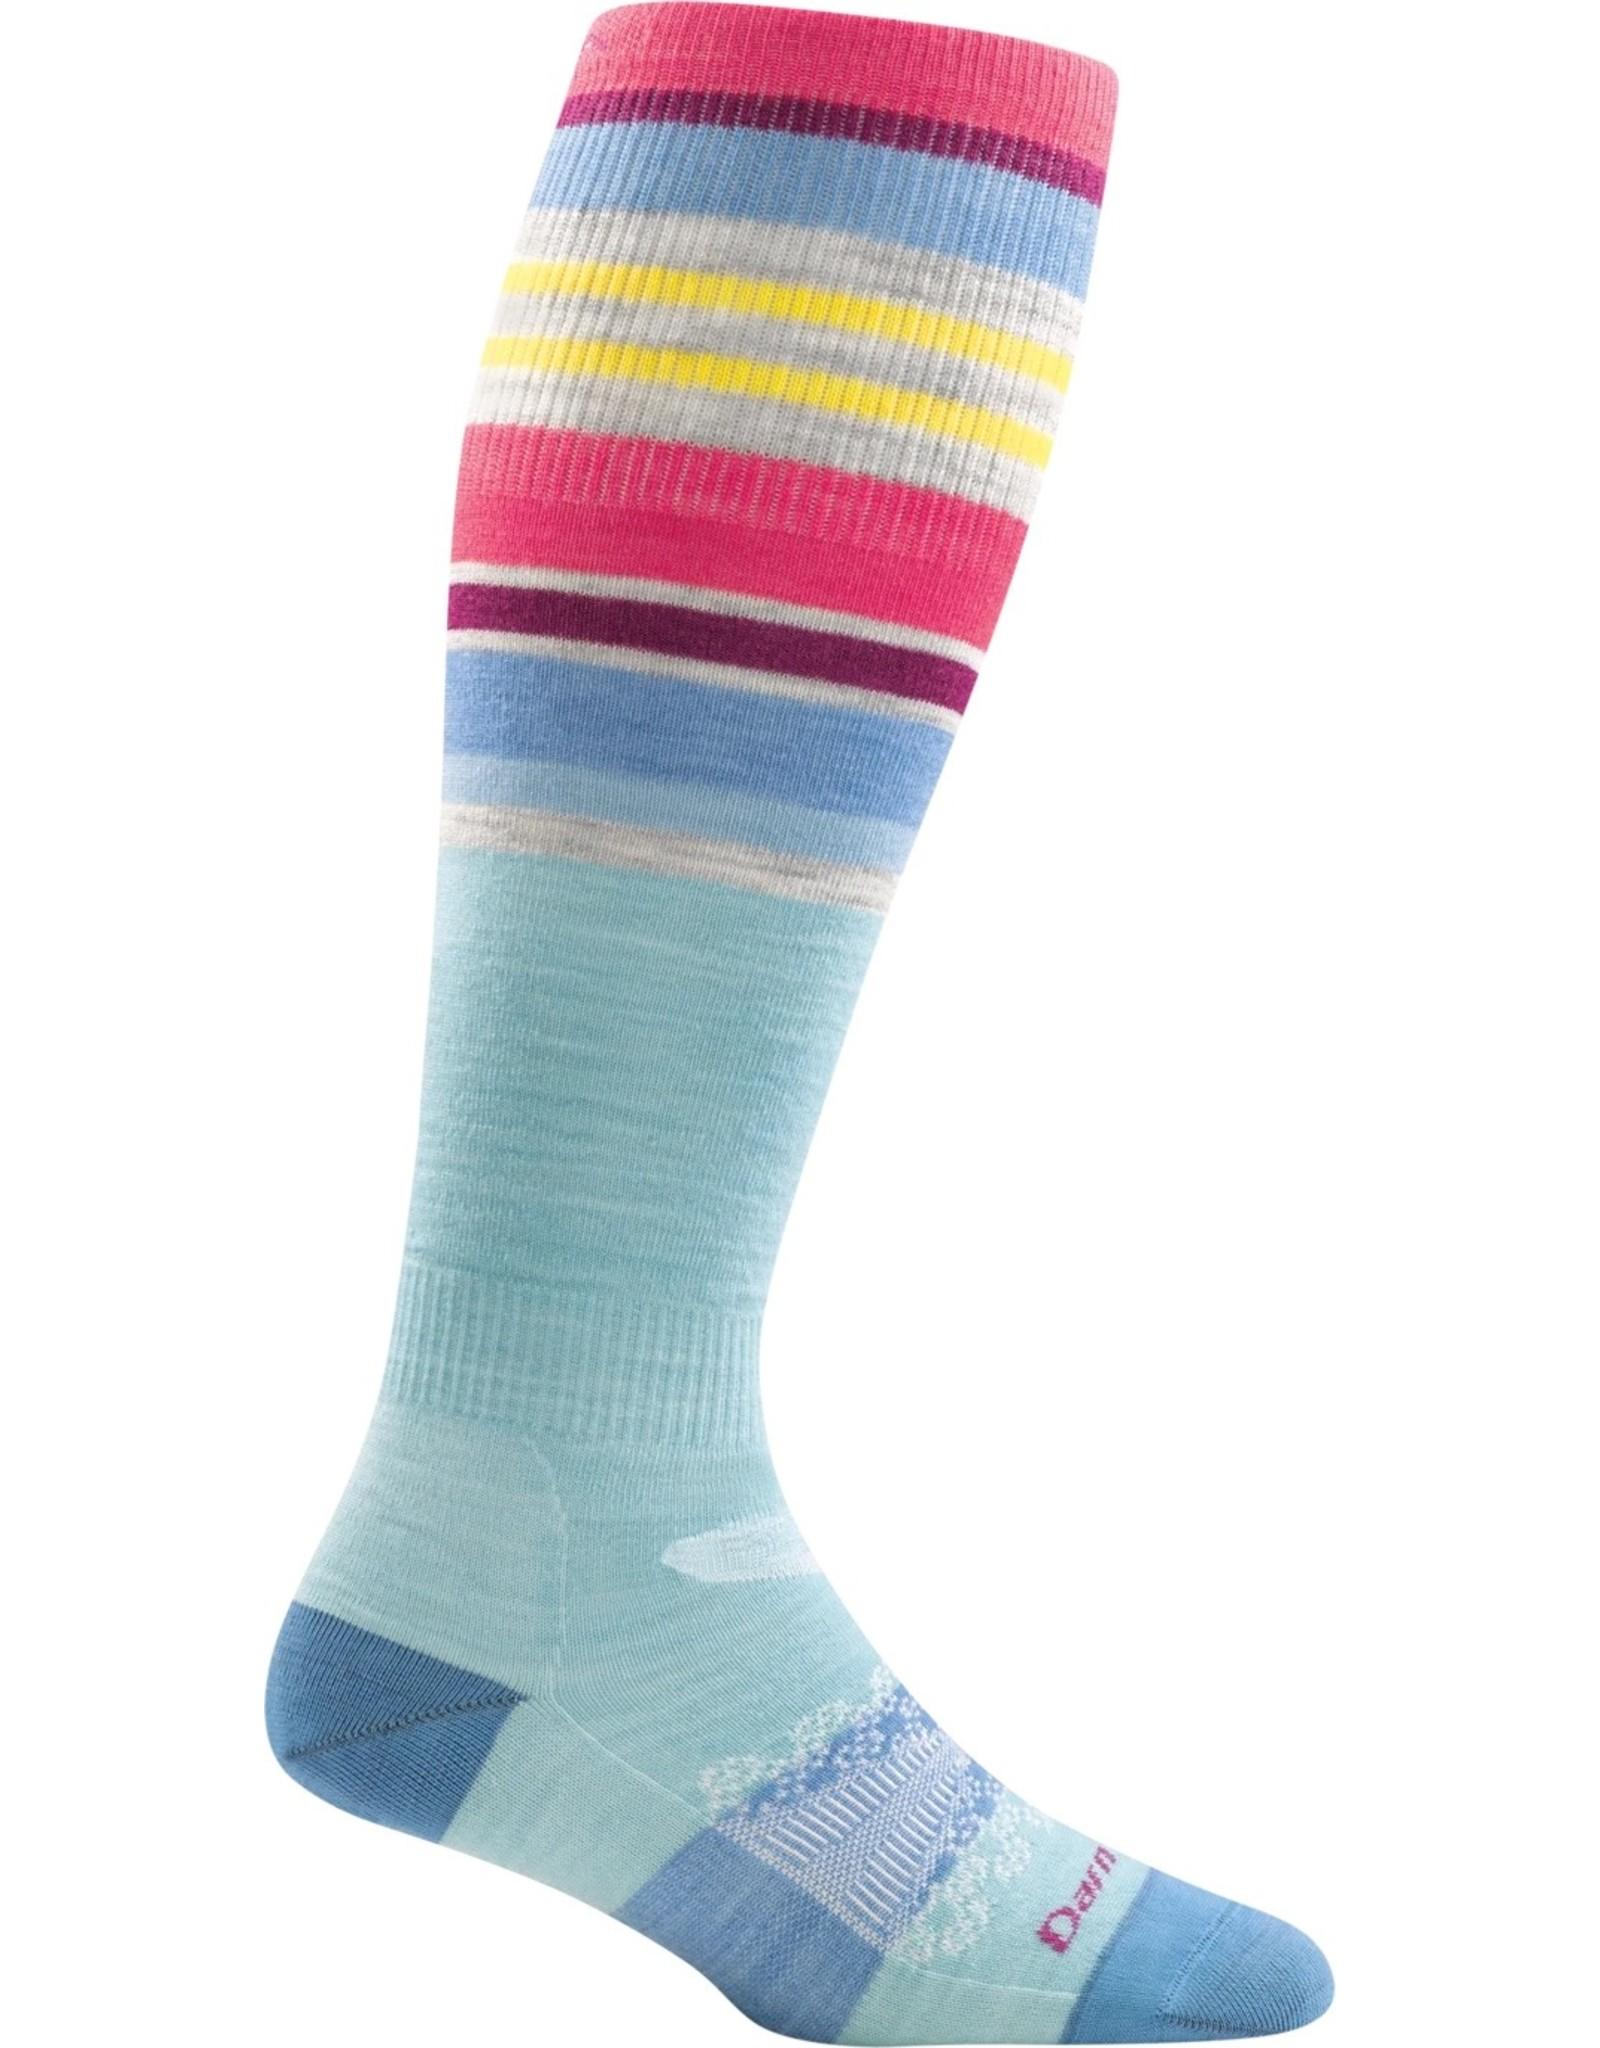 Darn Tough Darn Tough Glacier Stripe OTC Lightweight Women's Socks